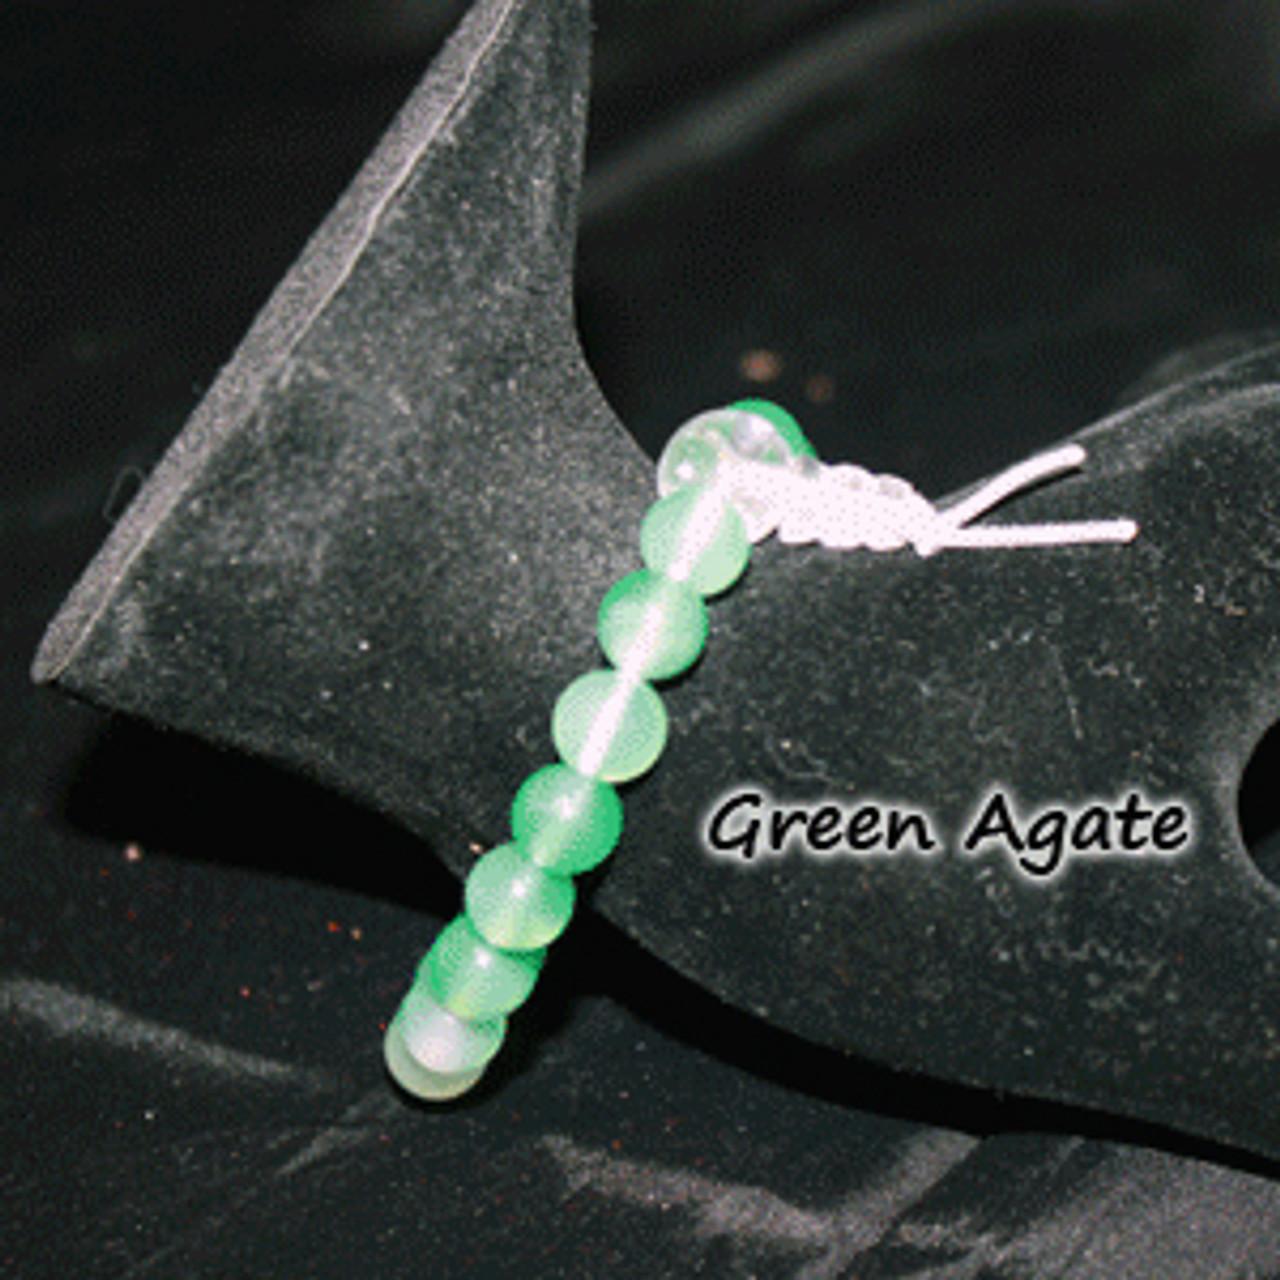 Green agate stone bracelets